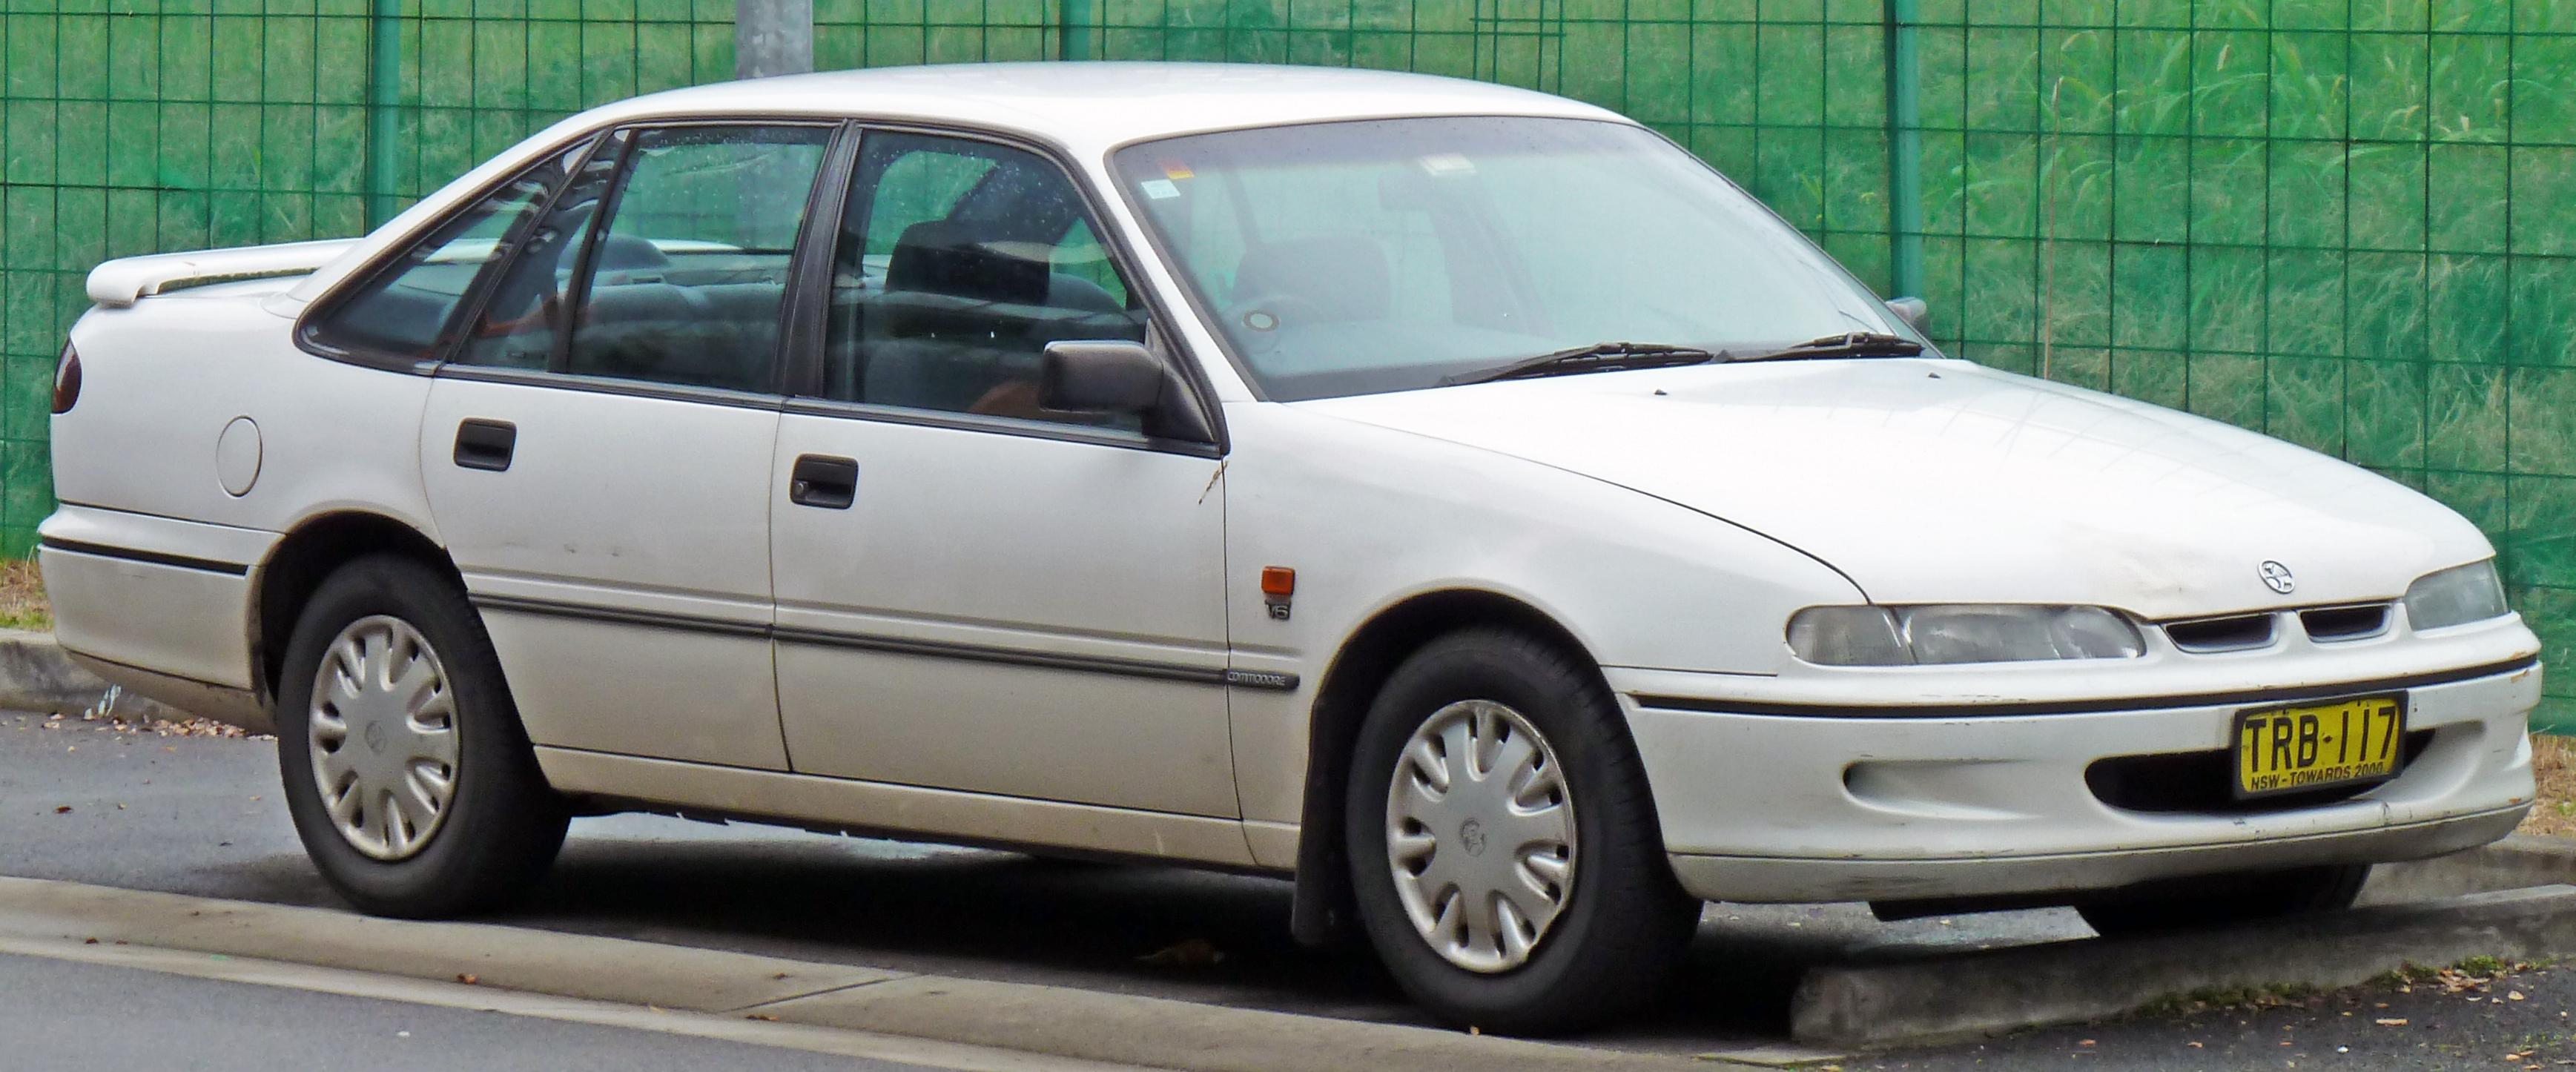 file19951996 holden vs commodore executive sedan 03jpg